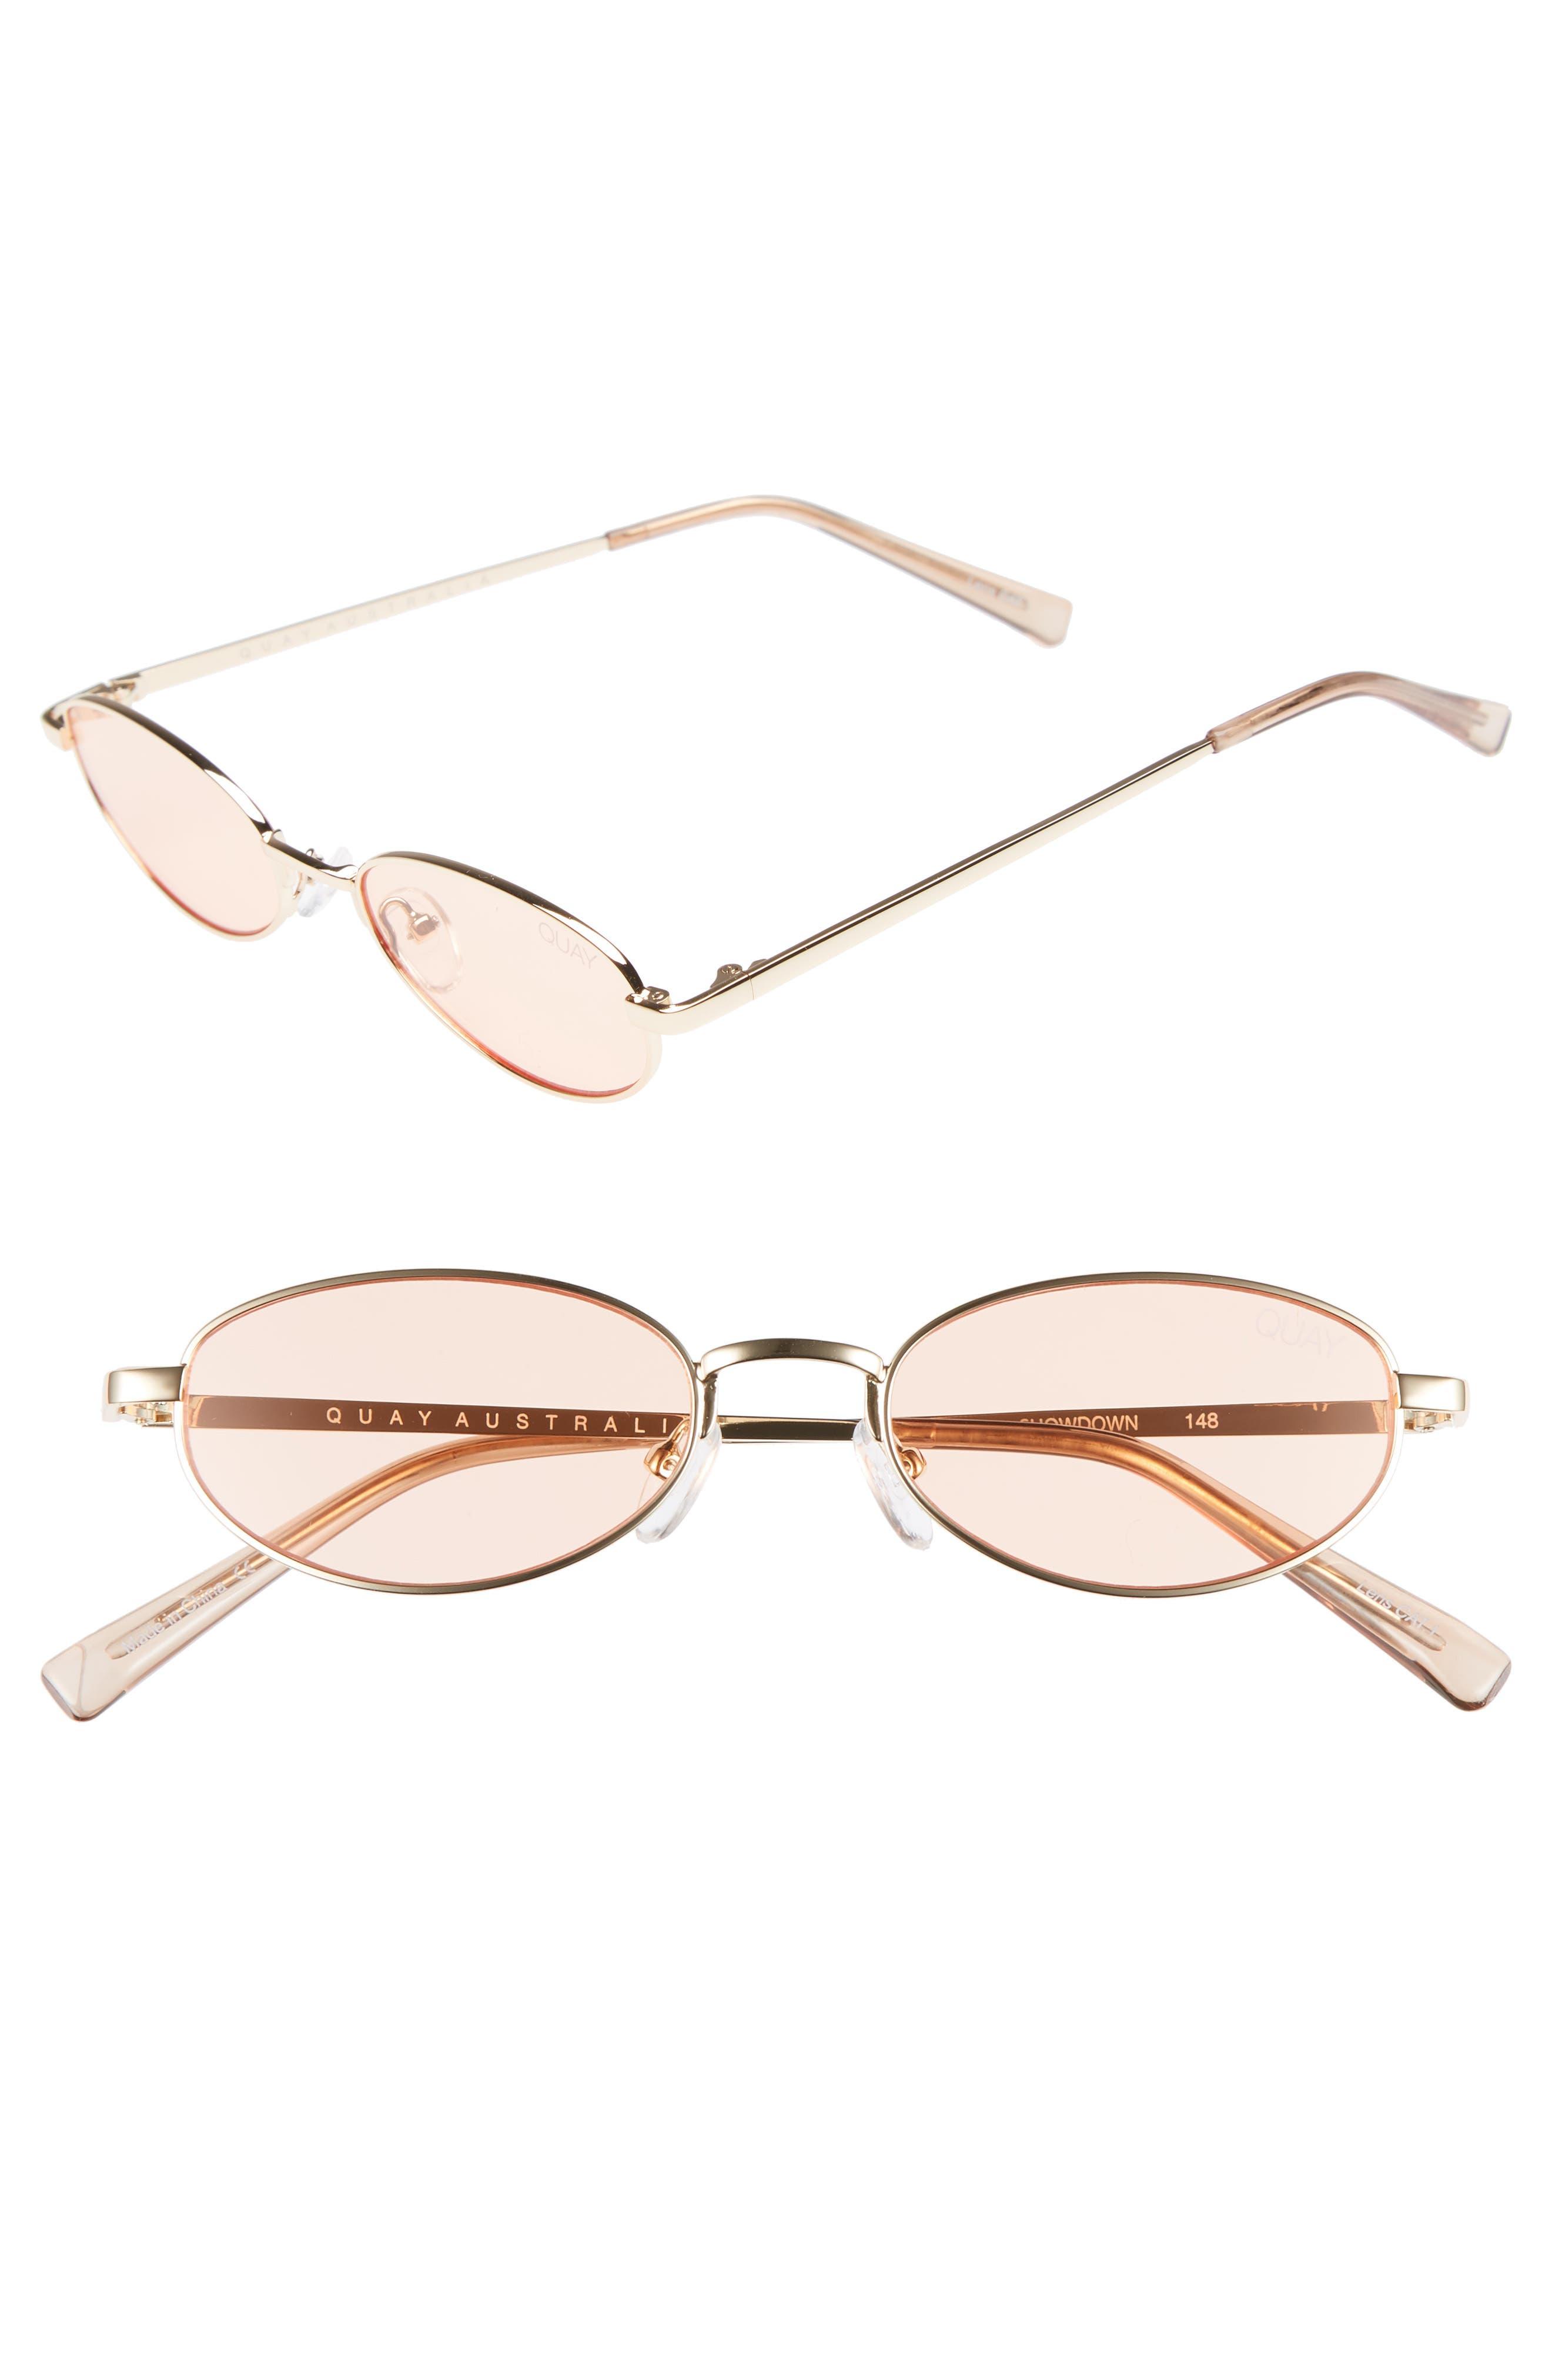 49mm Showdown Oval Sunglasses,                             Main thumbnail 1, color,                             GOLD